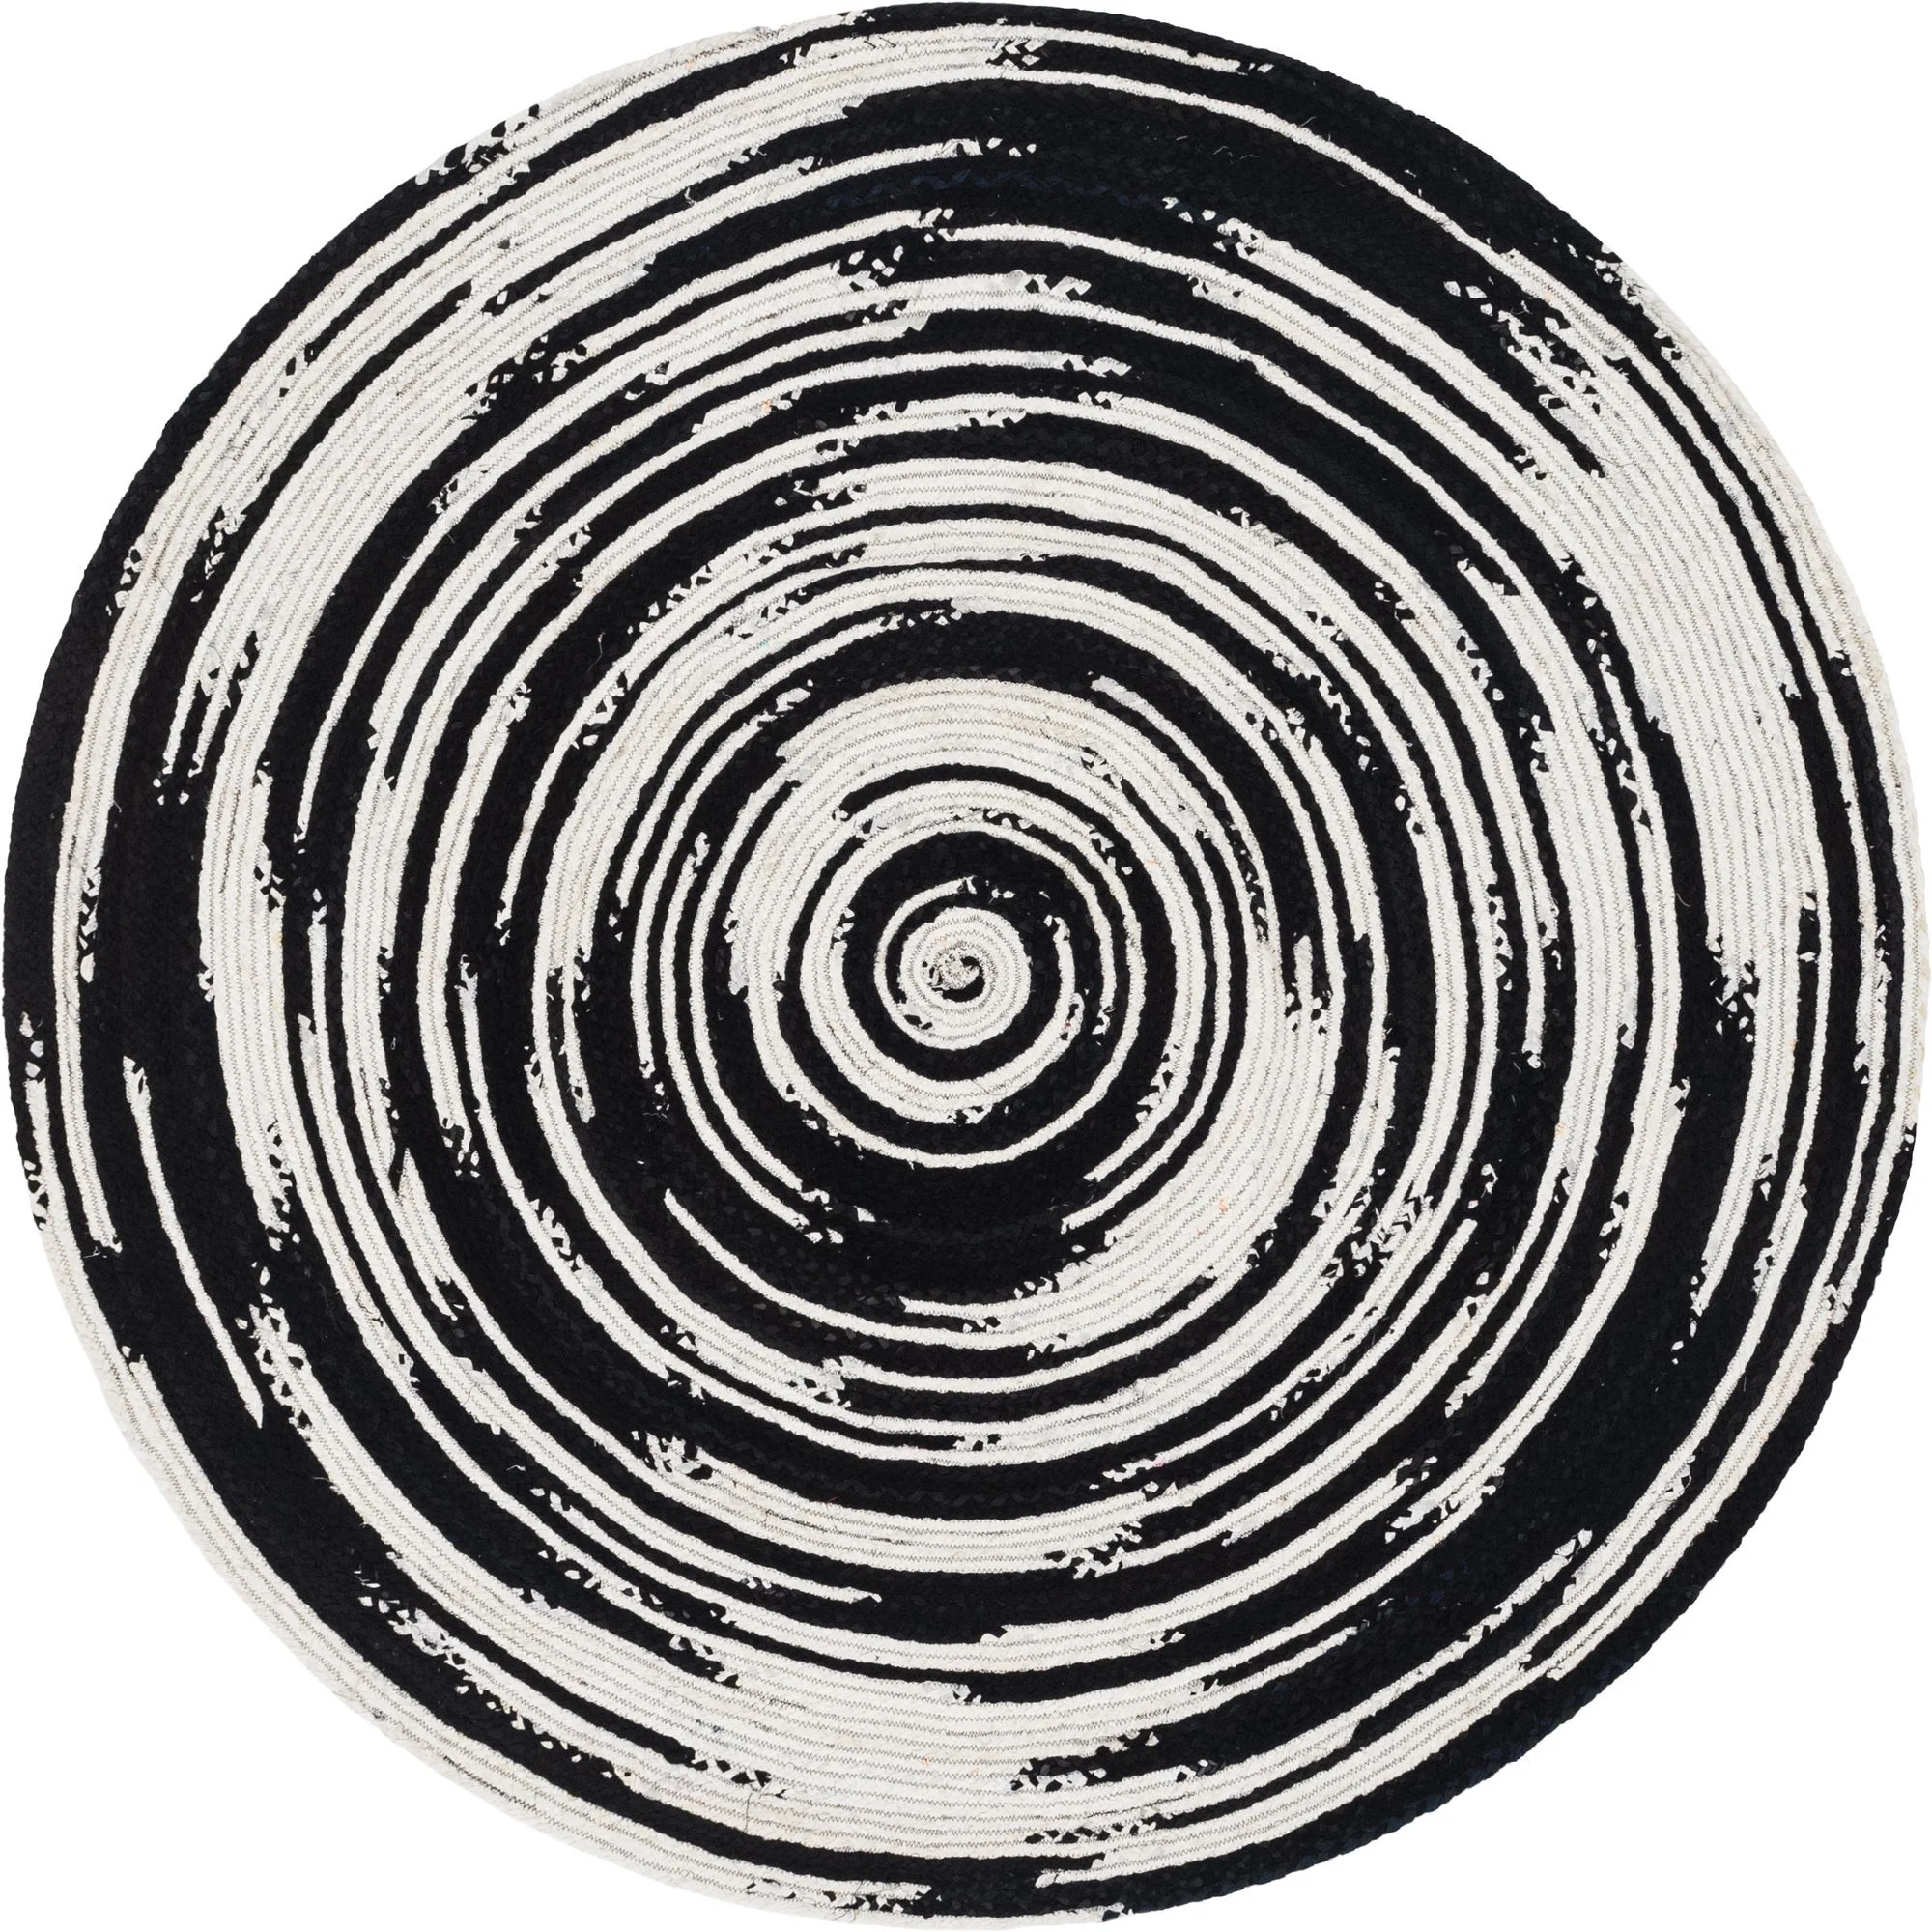 Black And White 8 X 8 Braided Chindi Round Rug Unique Loom